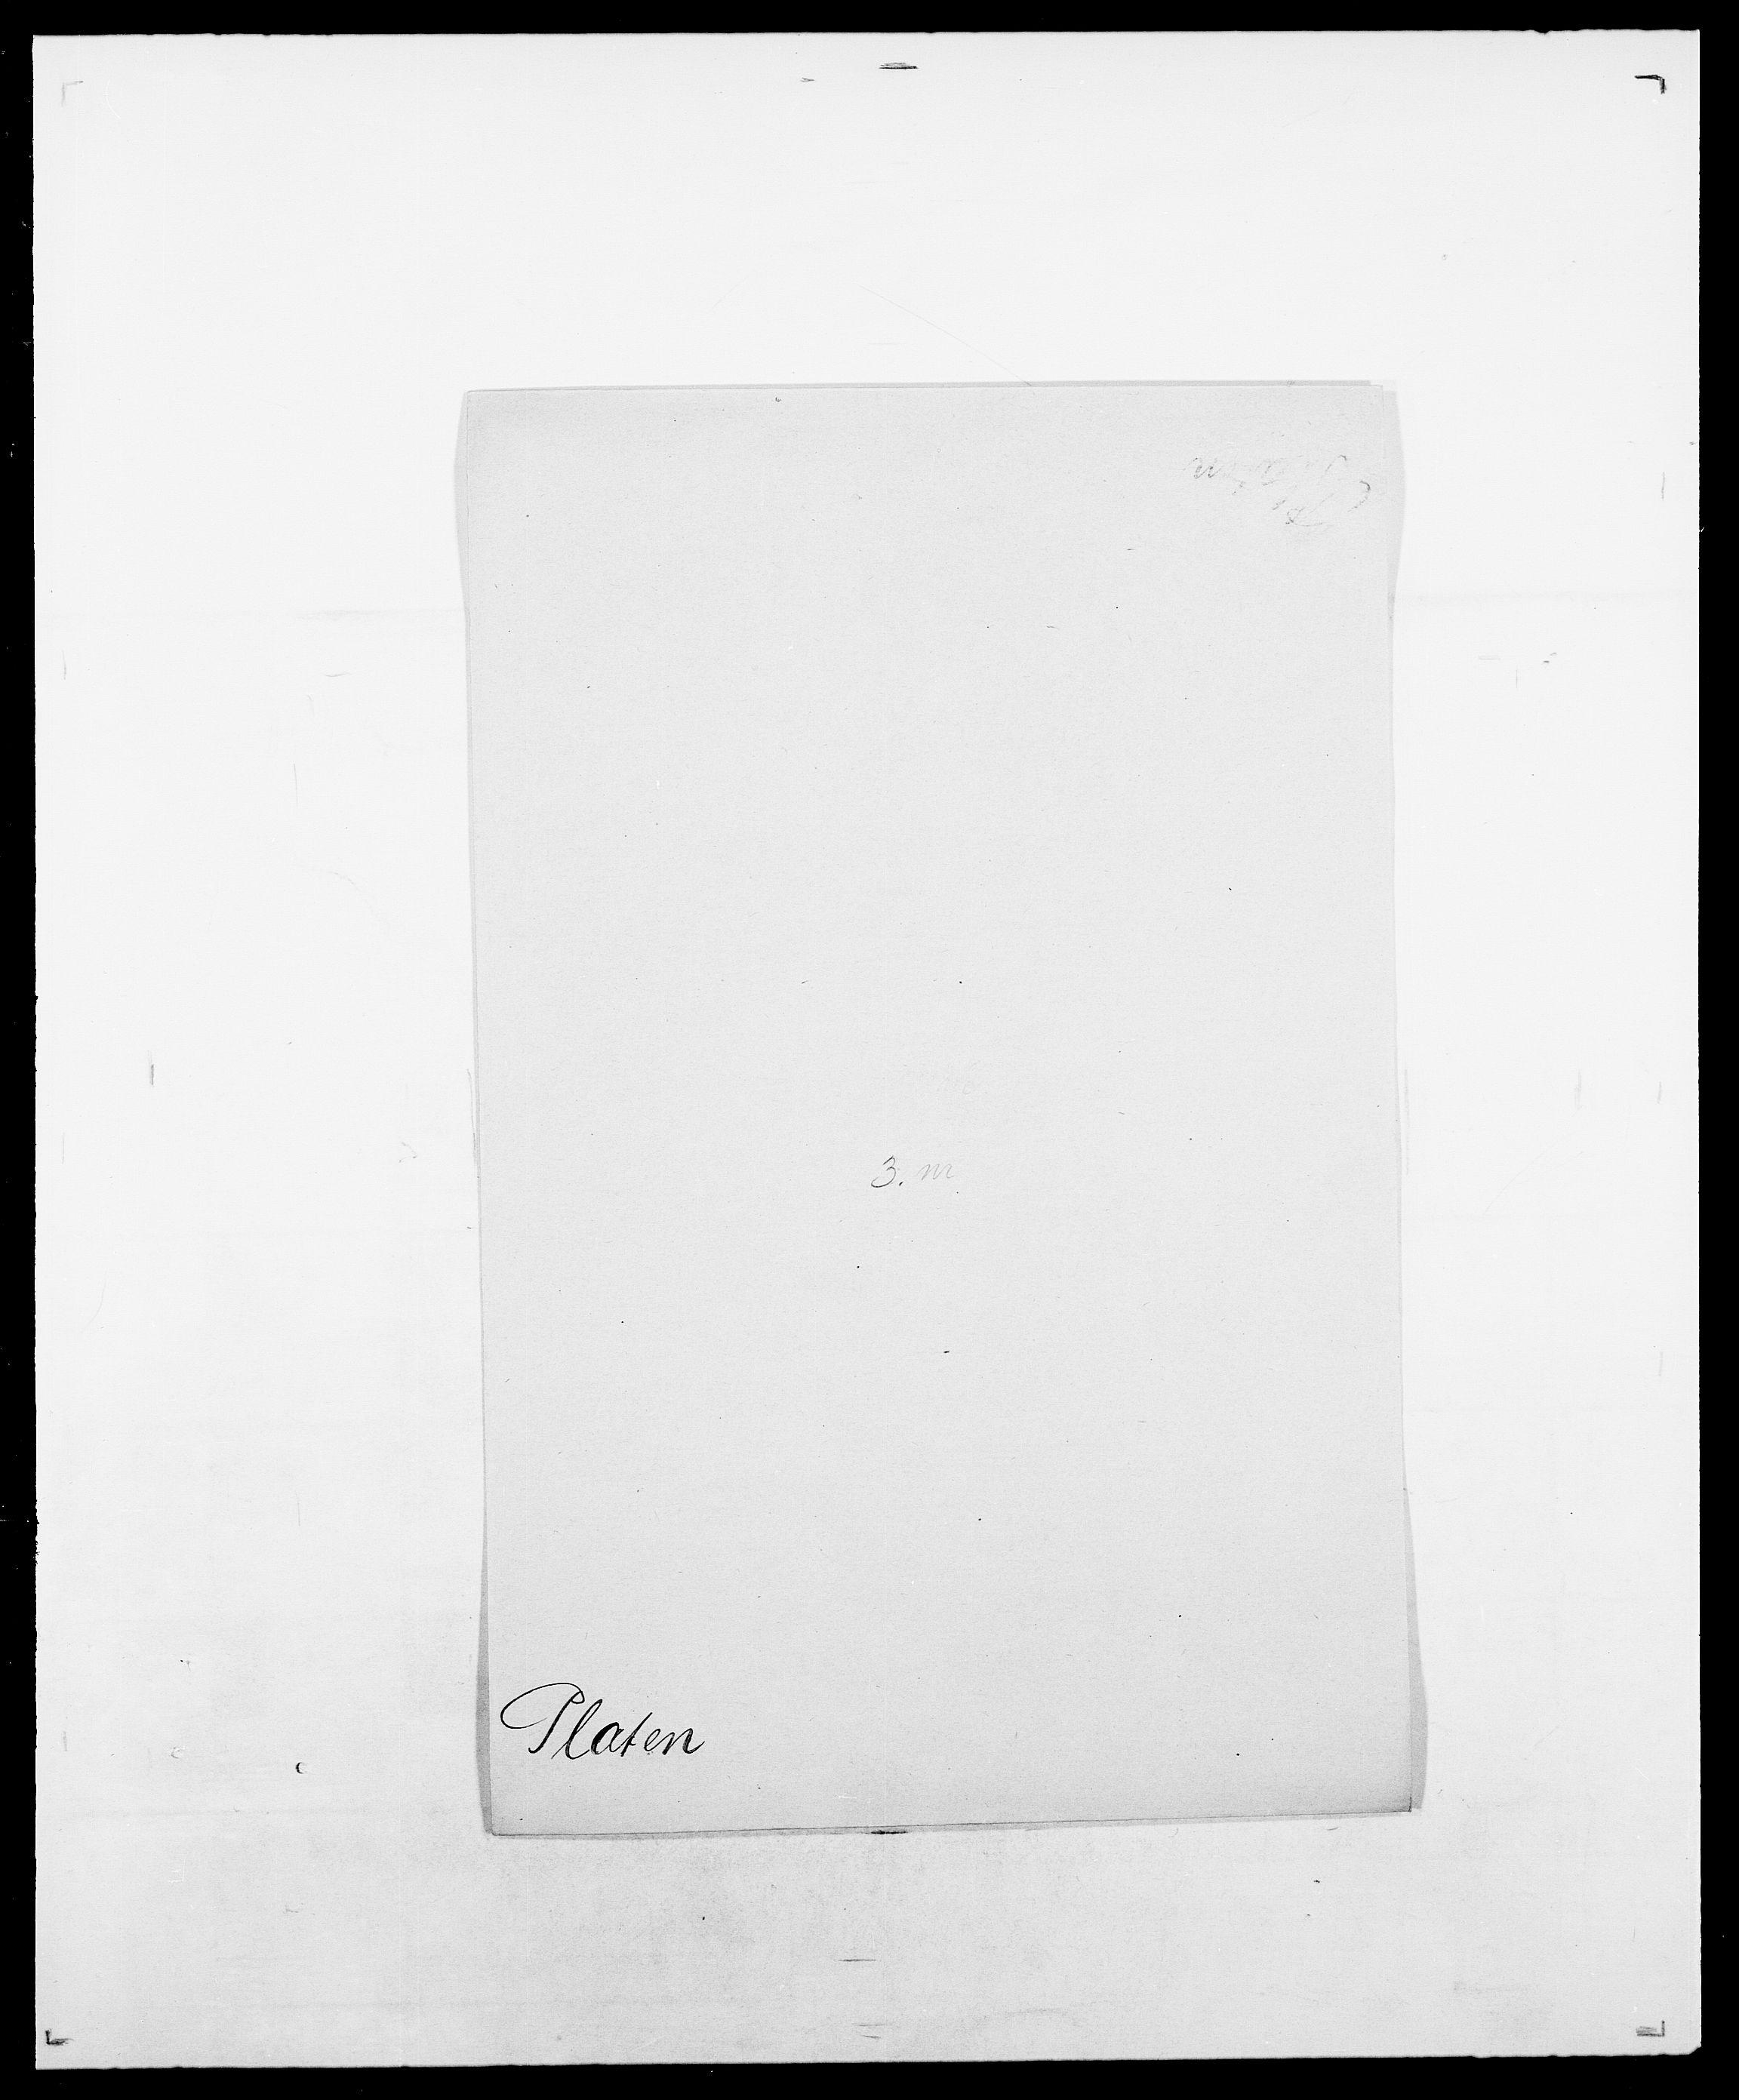 SAO, Delgobe, Charles Antoine - samling, D/Da/L0031: de Place - Raaum, s. 29